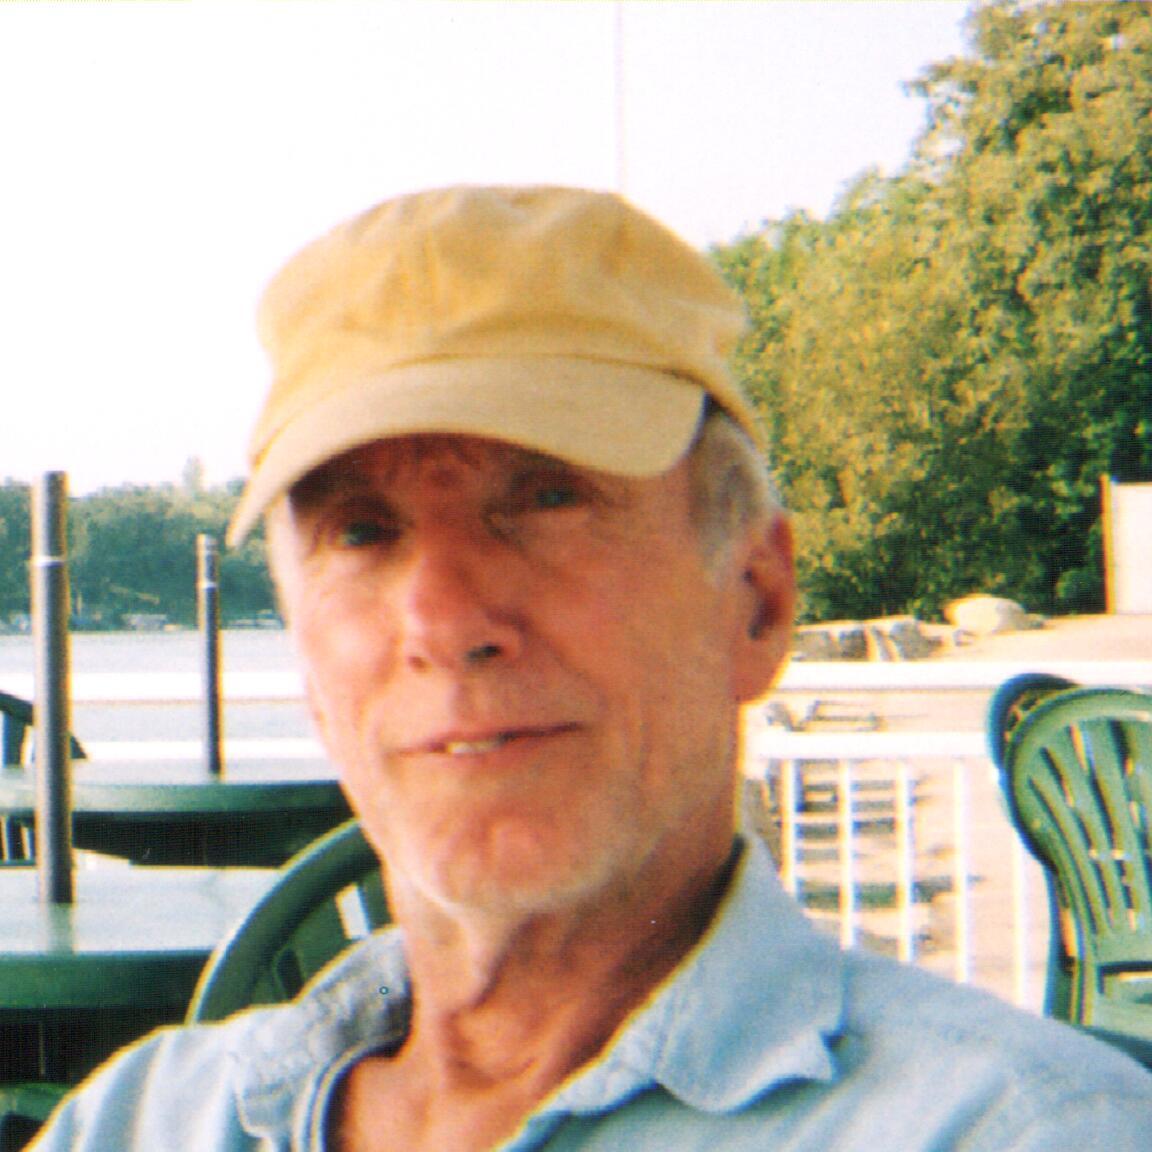 Wayne R. Einsweiler